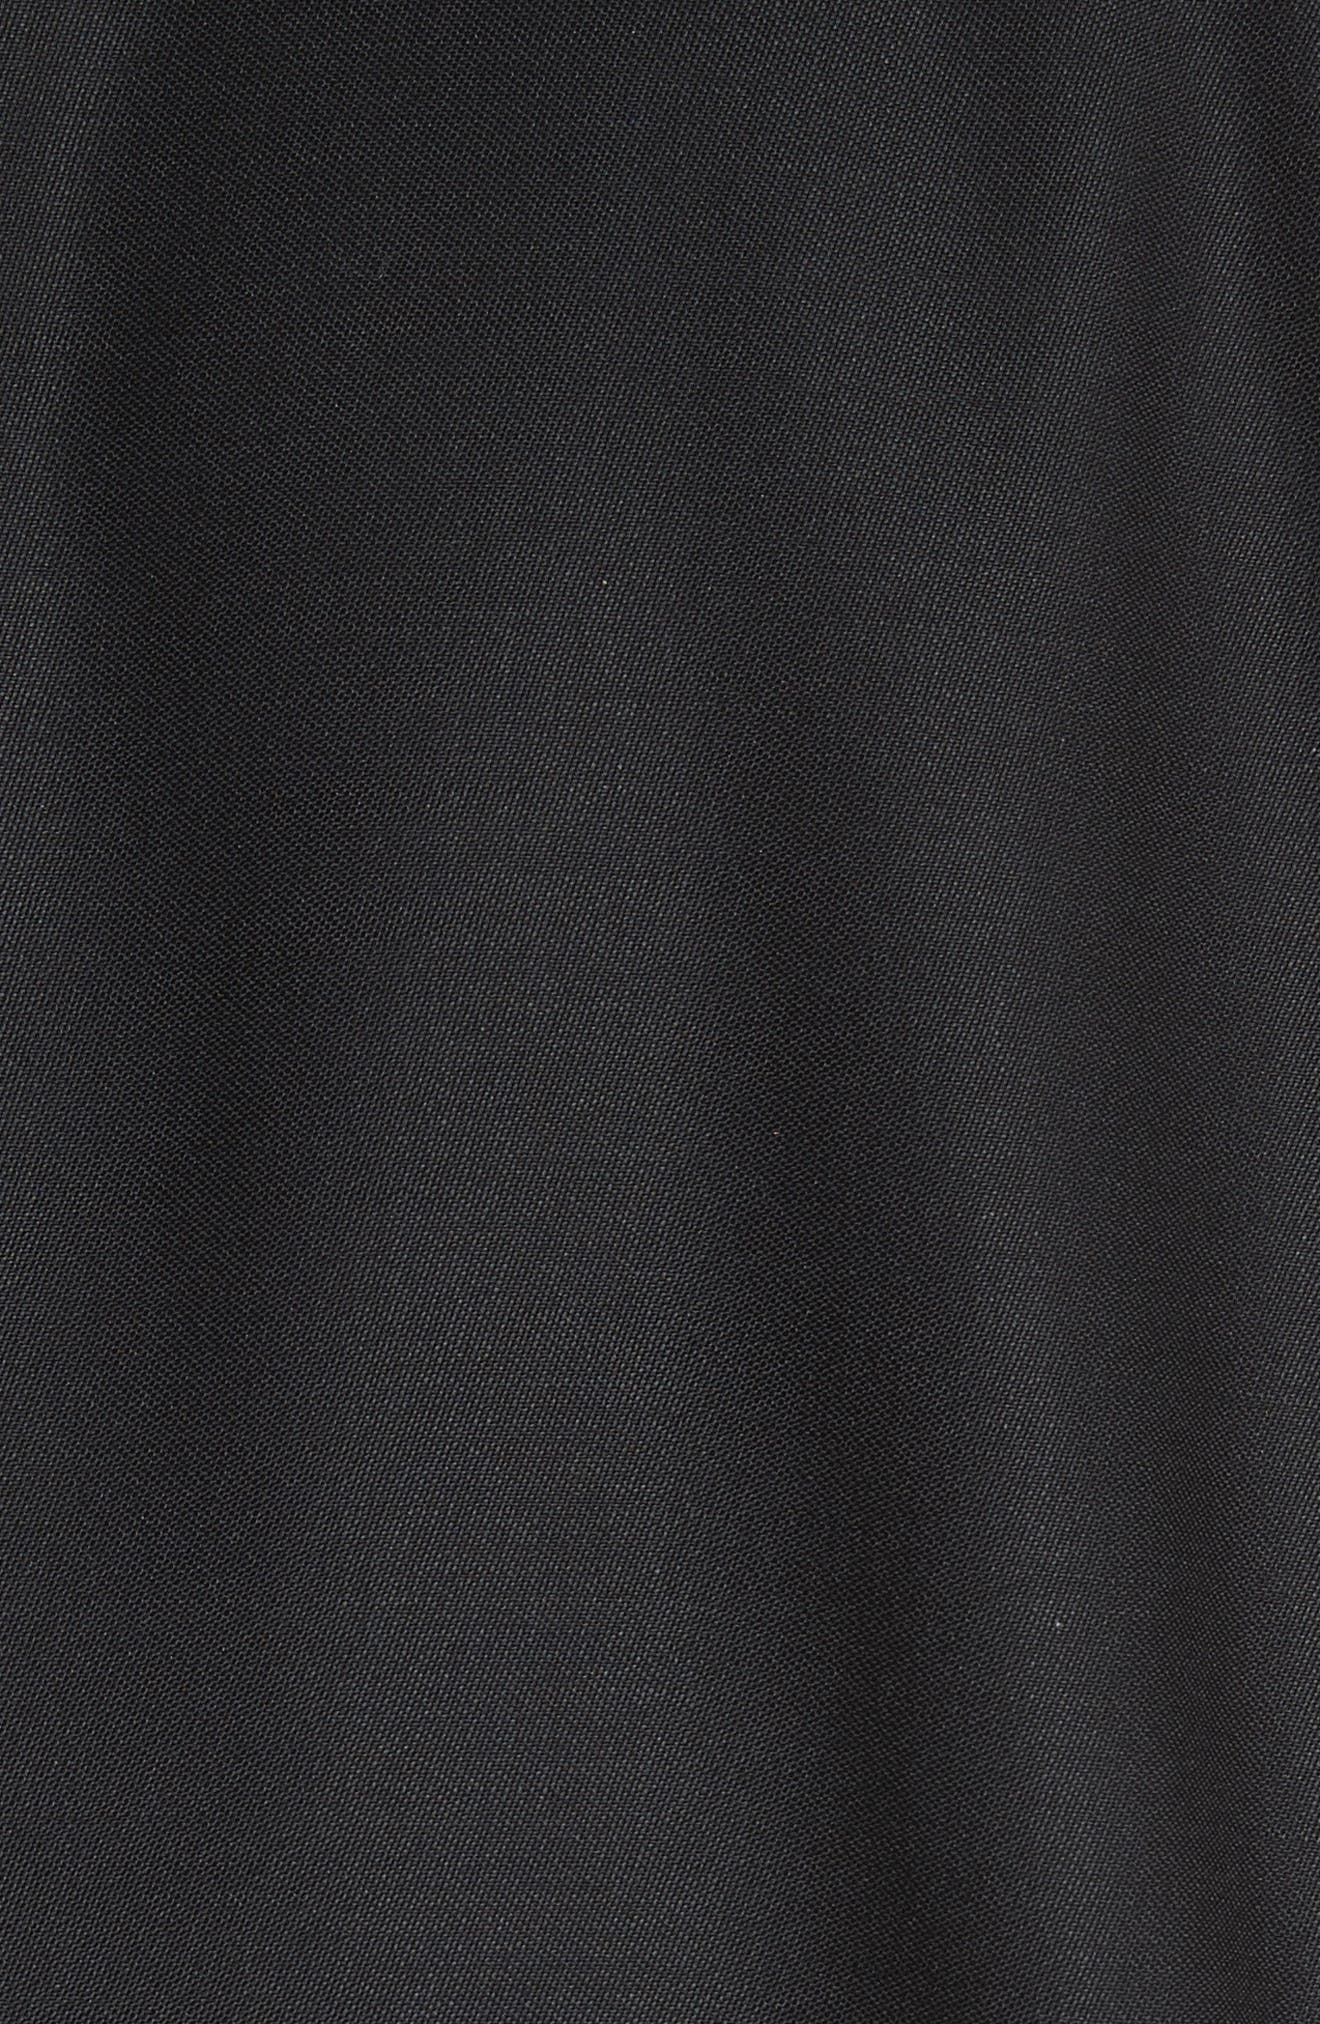 Thompson Wool & Mohair Blazer,                             Alternate thumbnail 7, color,                             BLACK